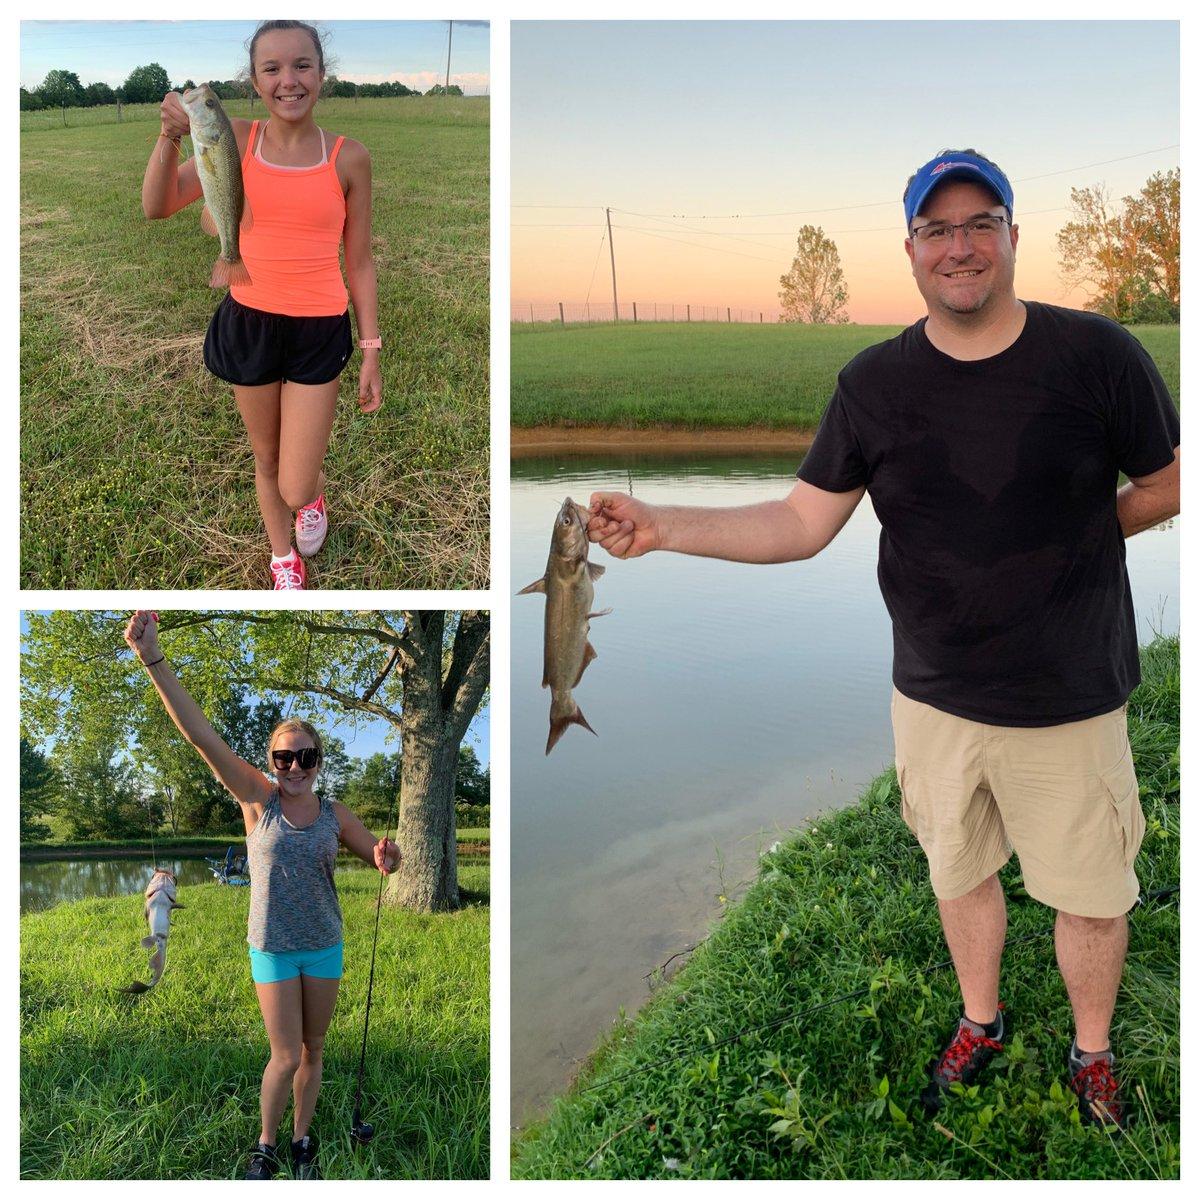 My girls were killing it at the pond last night!  I've taught them well!<br>http://pic.twitter.com/sI0pfN0qzW